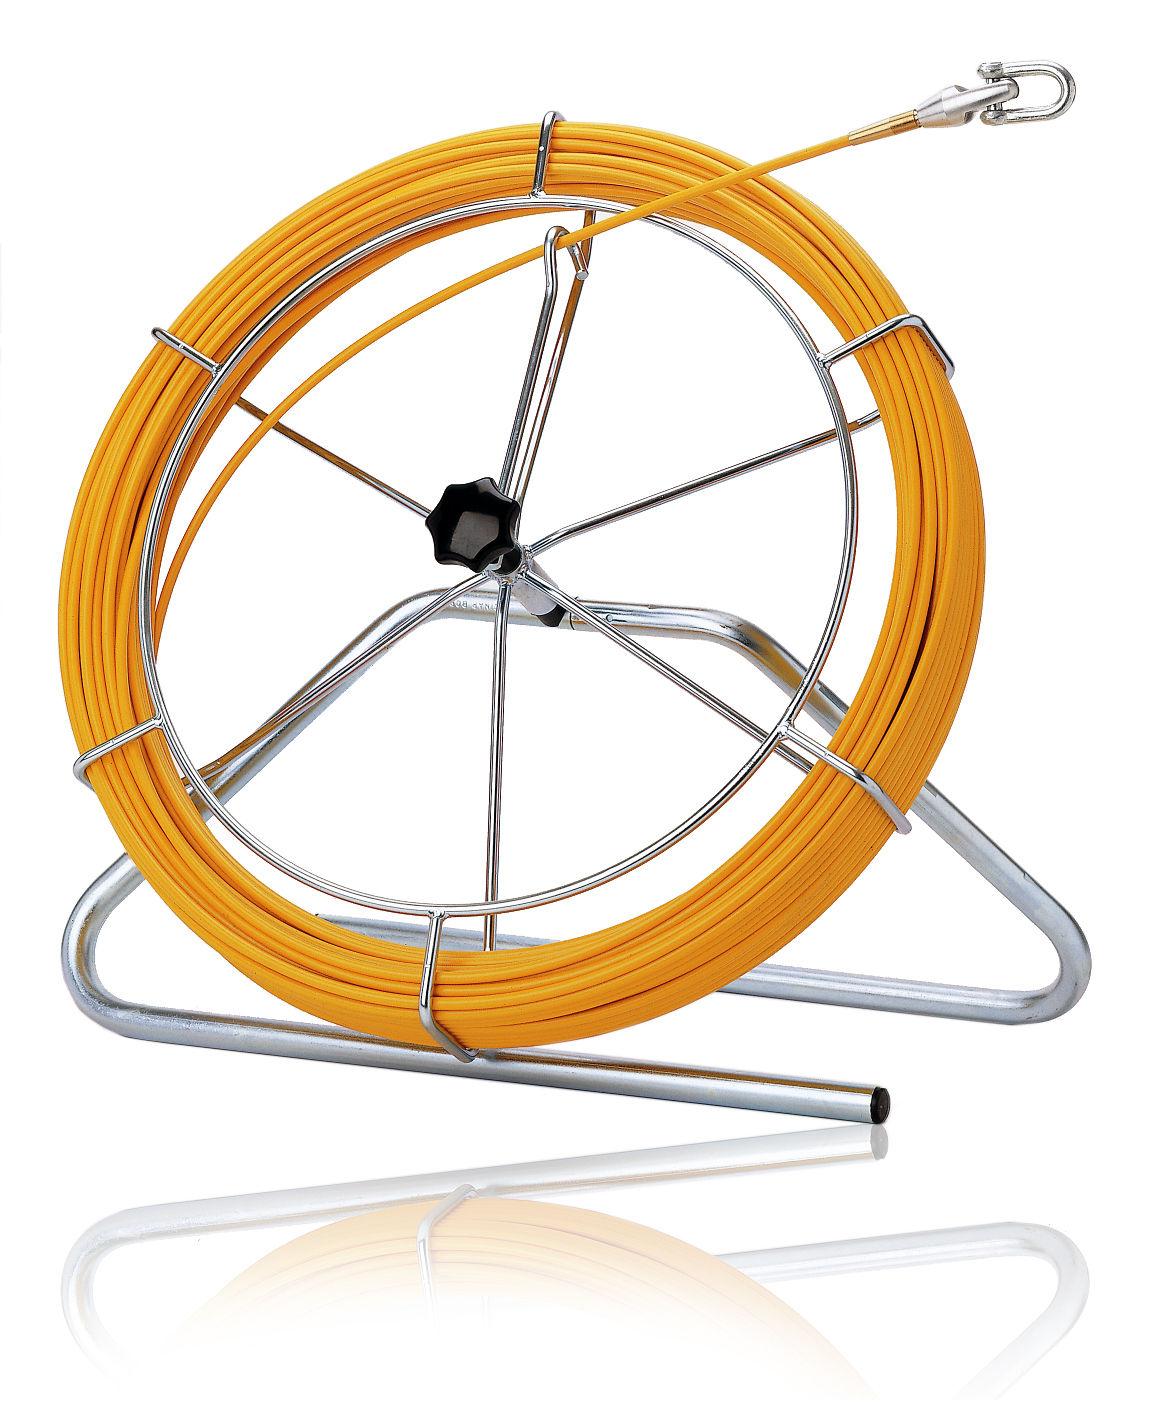 Tire Câble Kabeljet Cablejet Katimex Cielker Gmbh